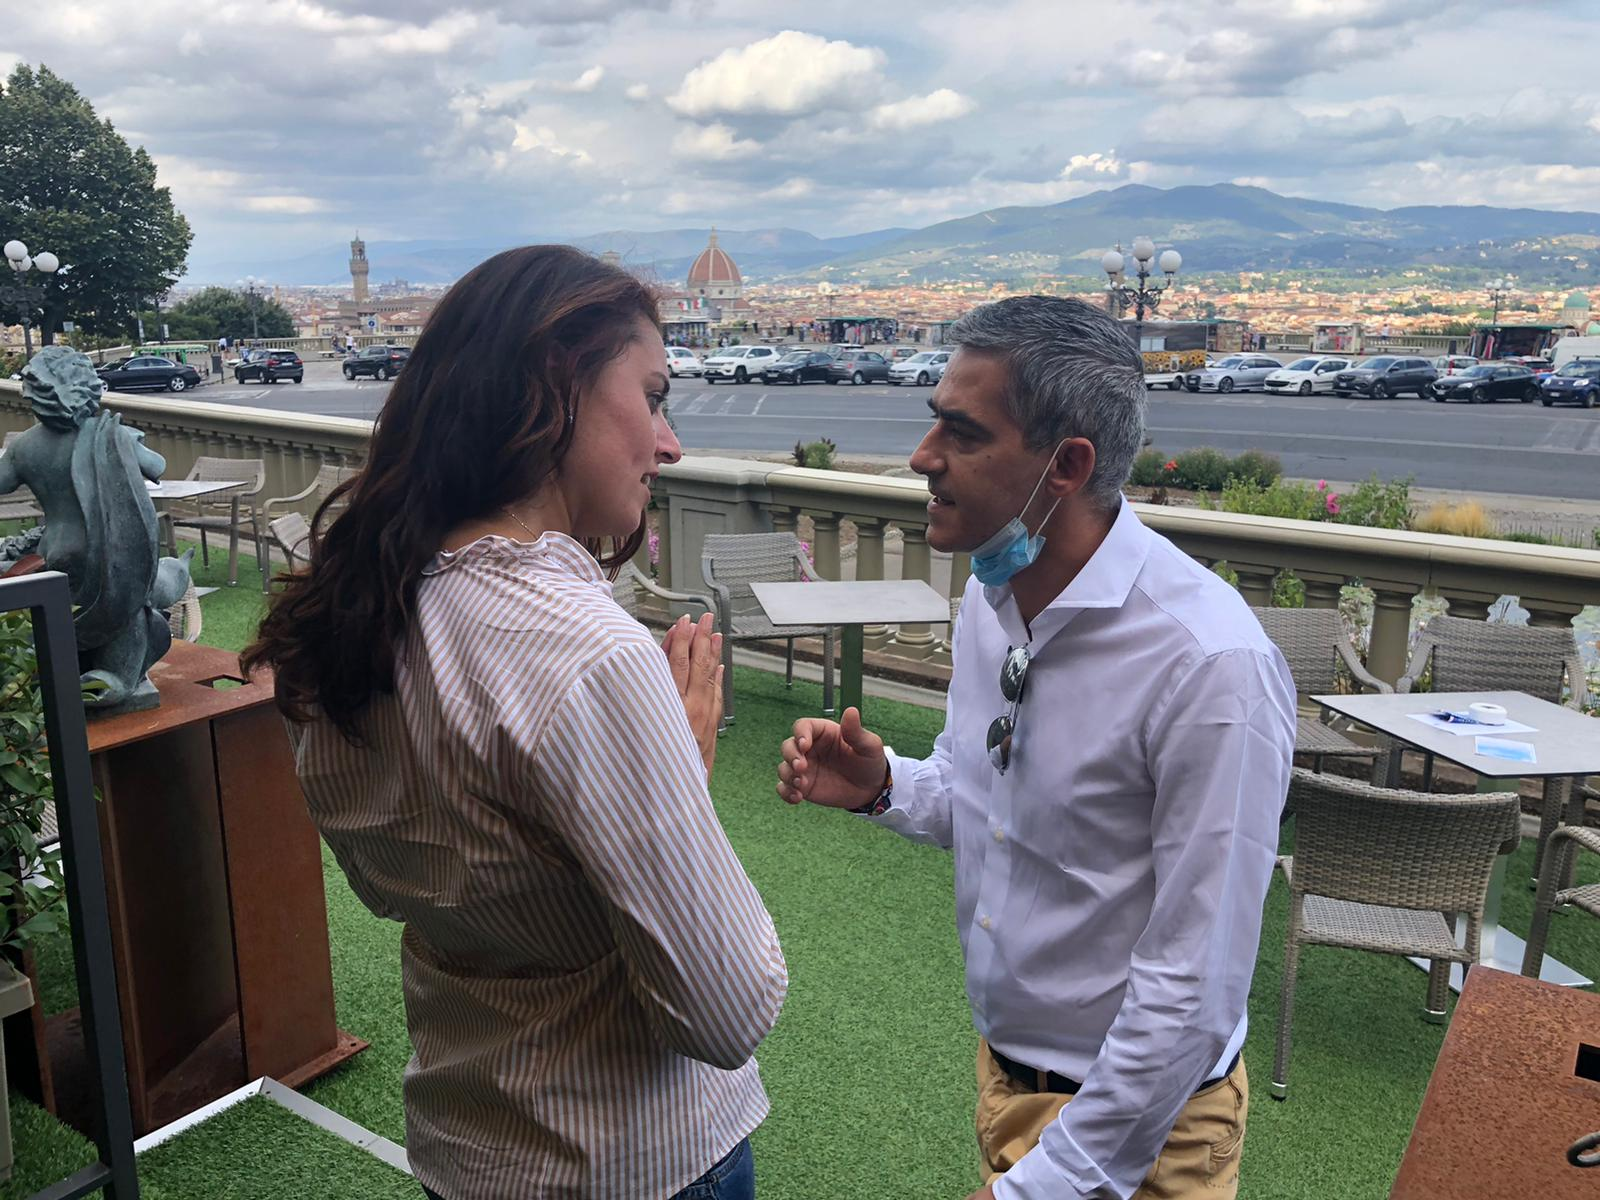 Coordinamento regionale a porte aperte a Firenze 28